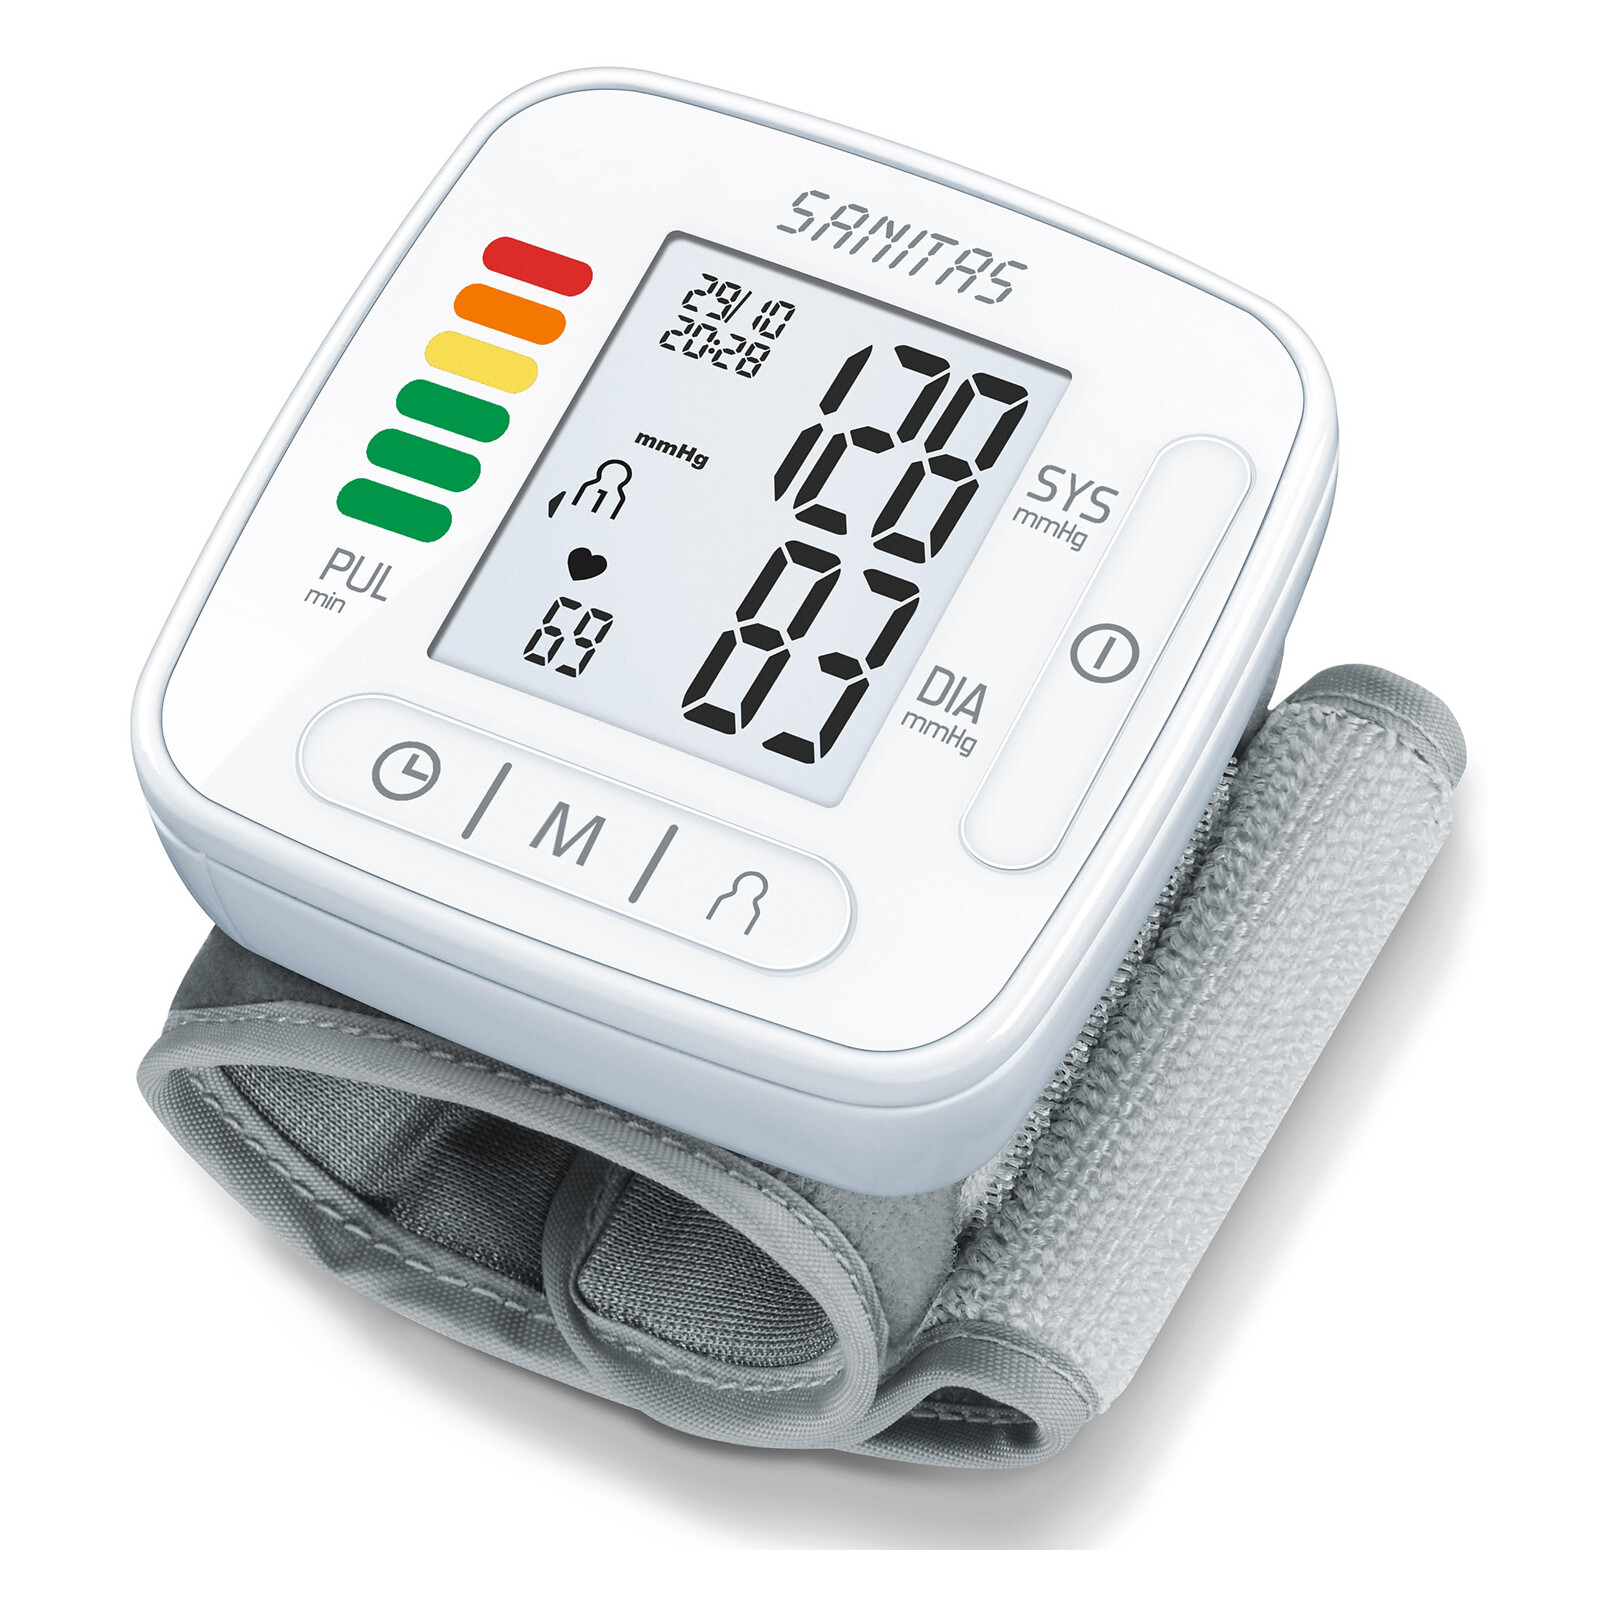 Sanitas SBC 22 Blutdruckmessgerät Handgelenk